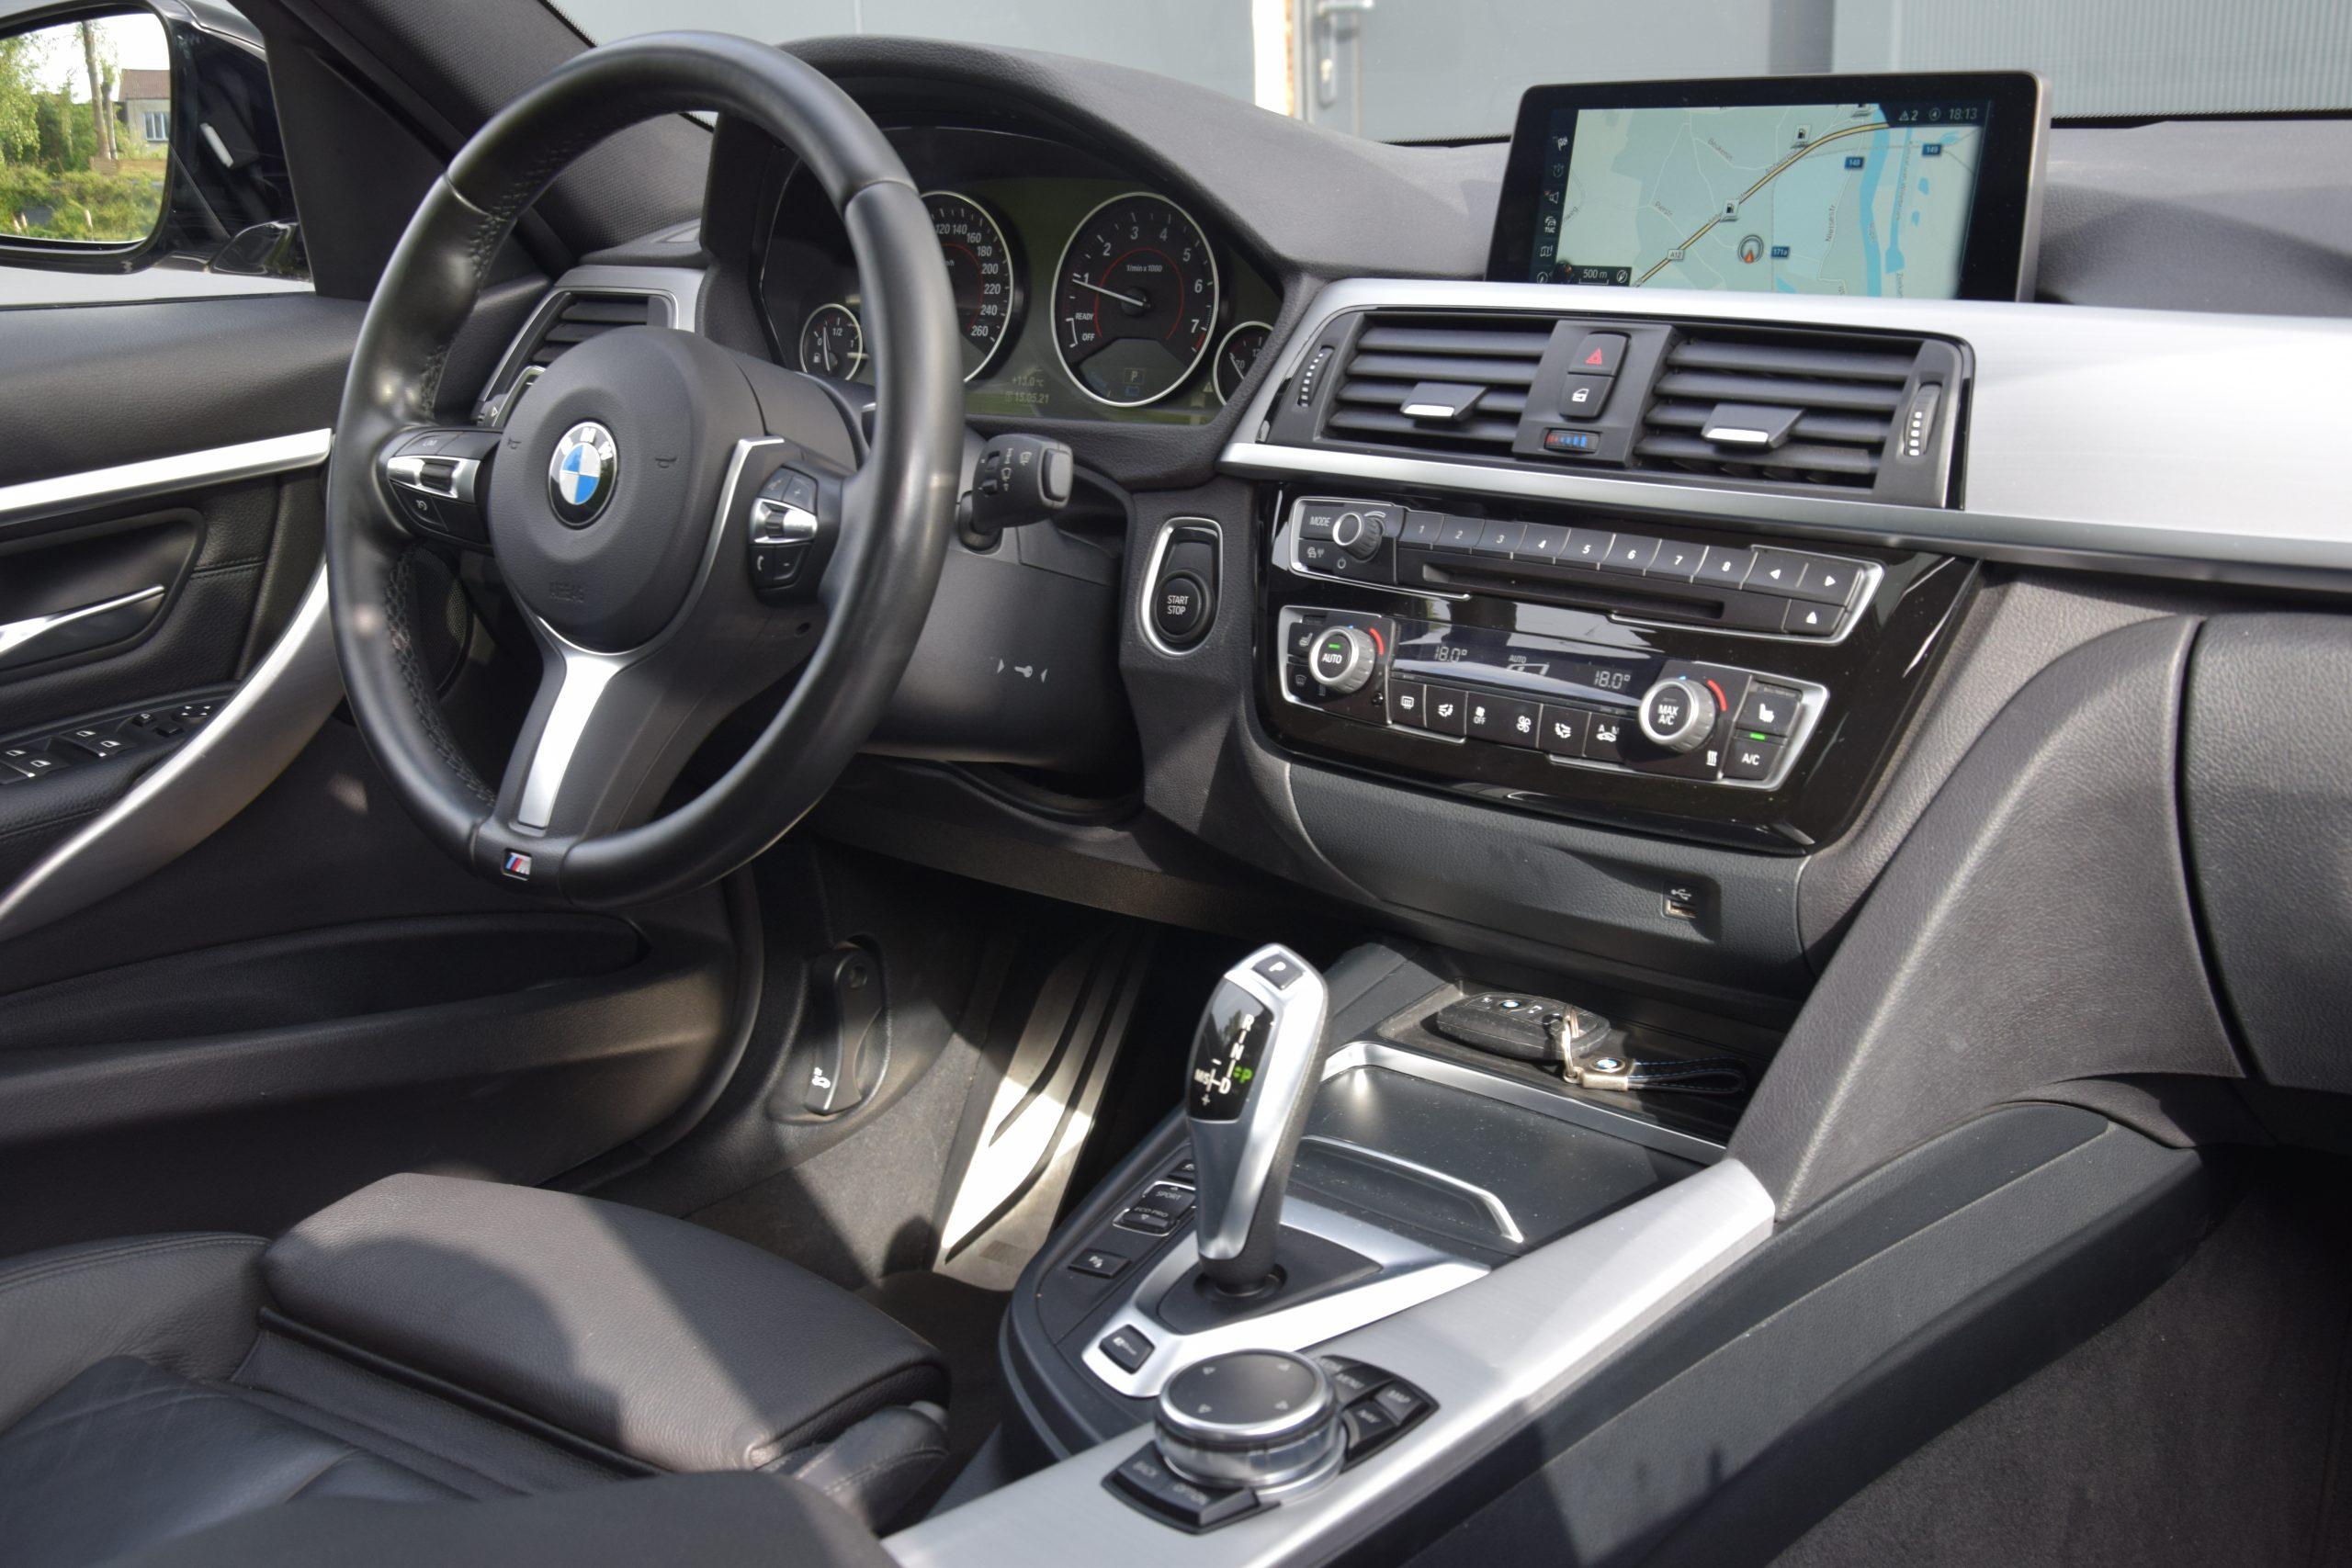 BMW 330e Iperformance Hybride M-Sportpakket 01/2017